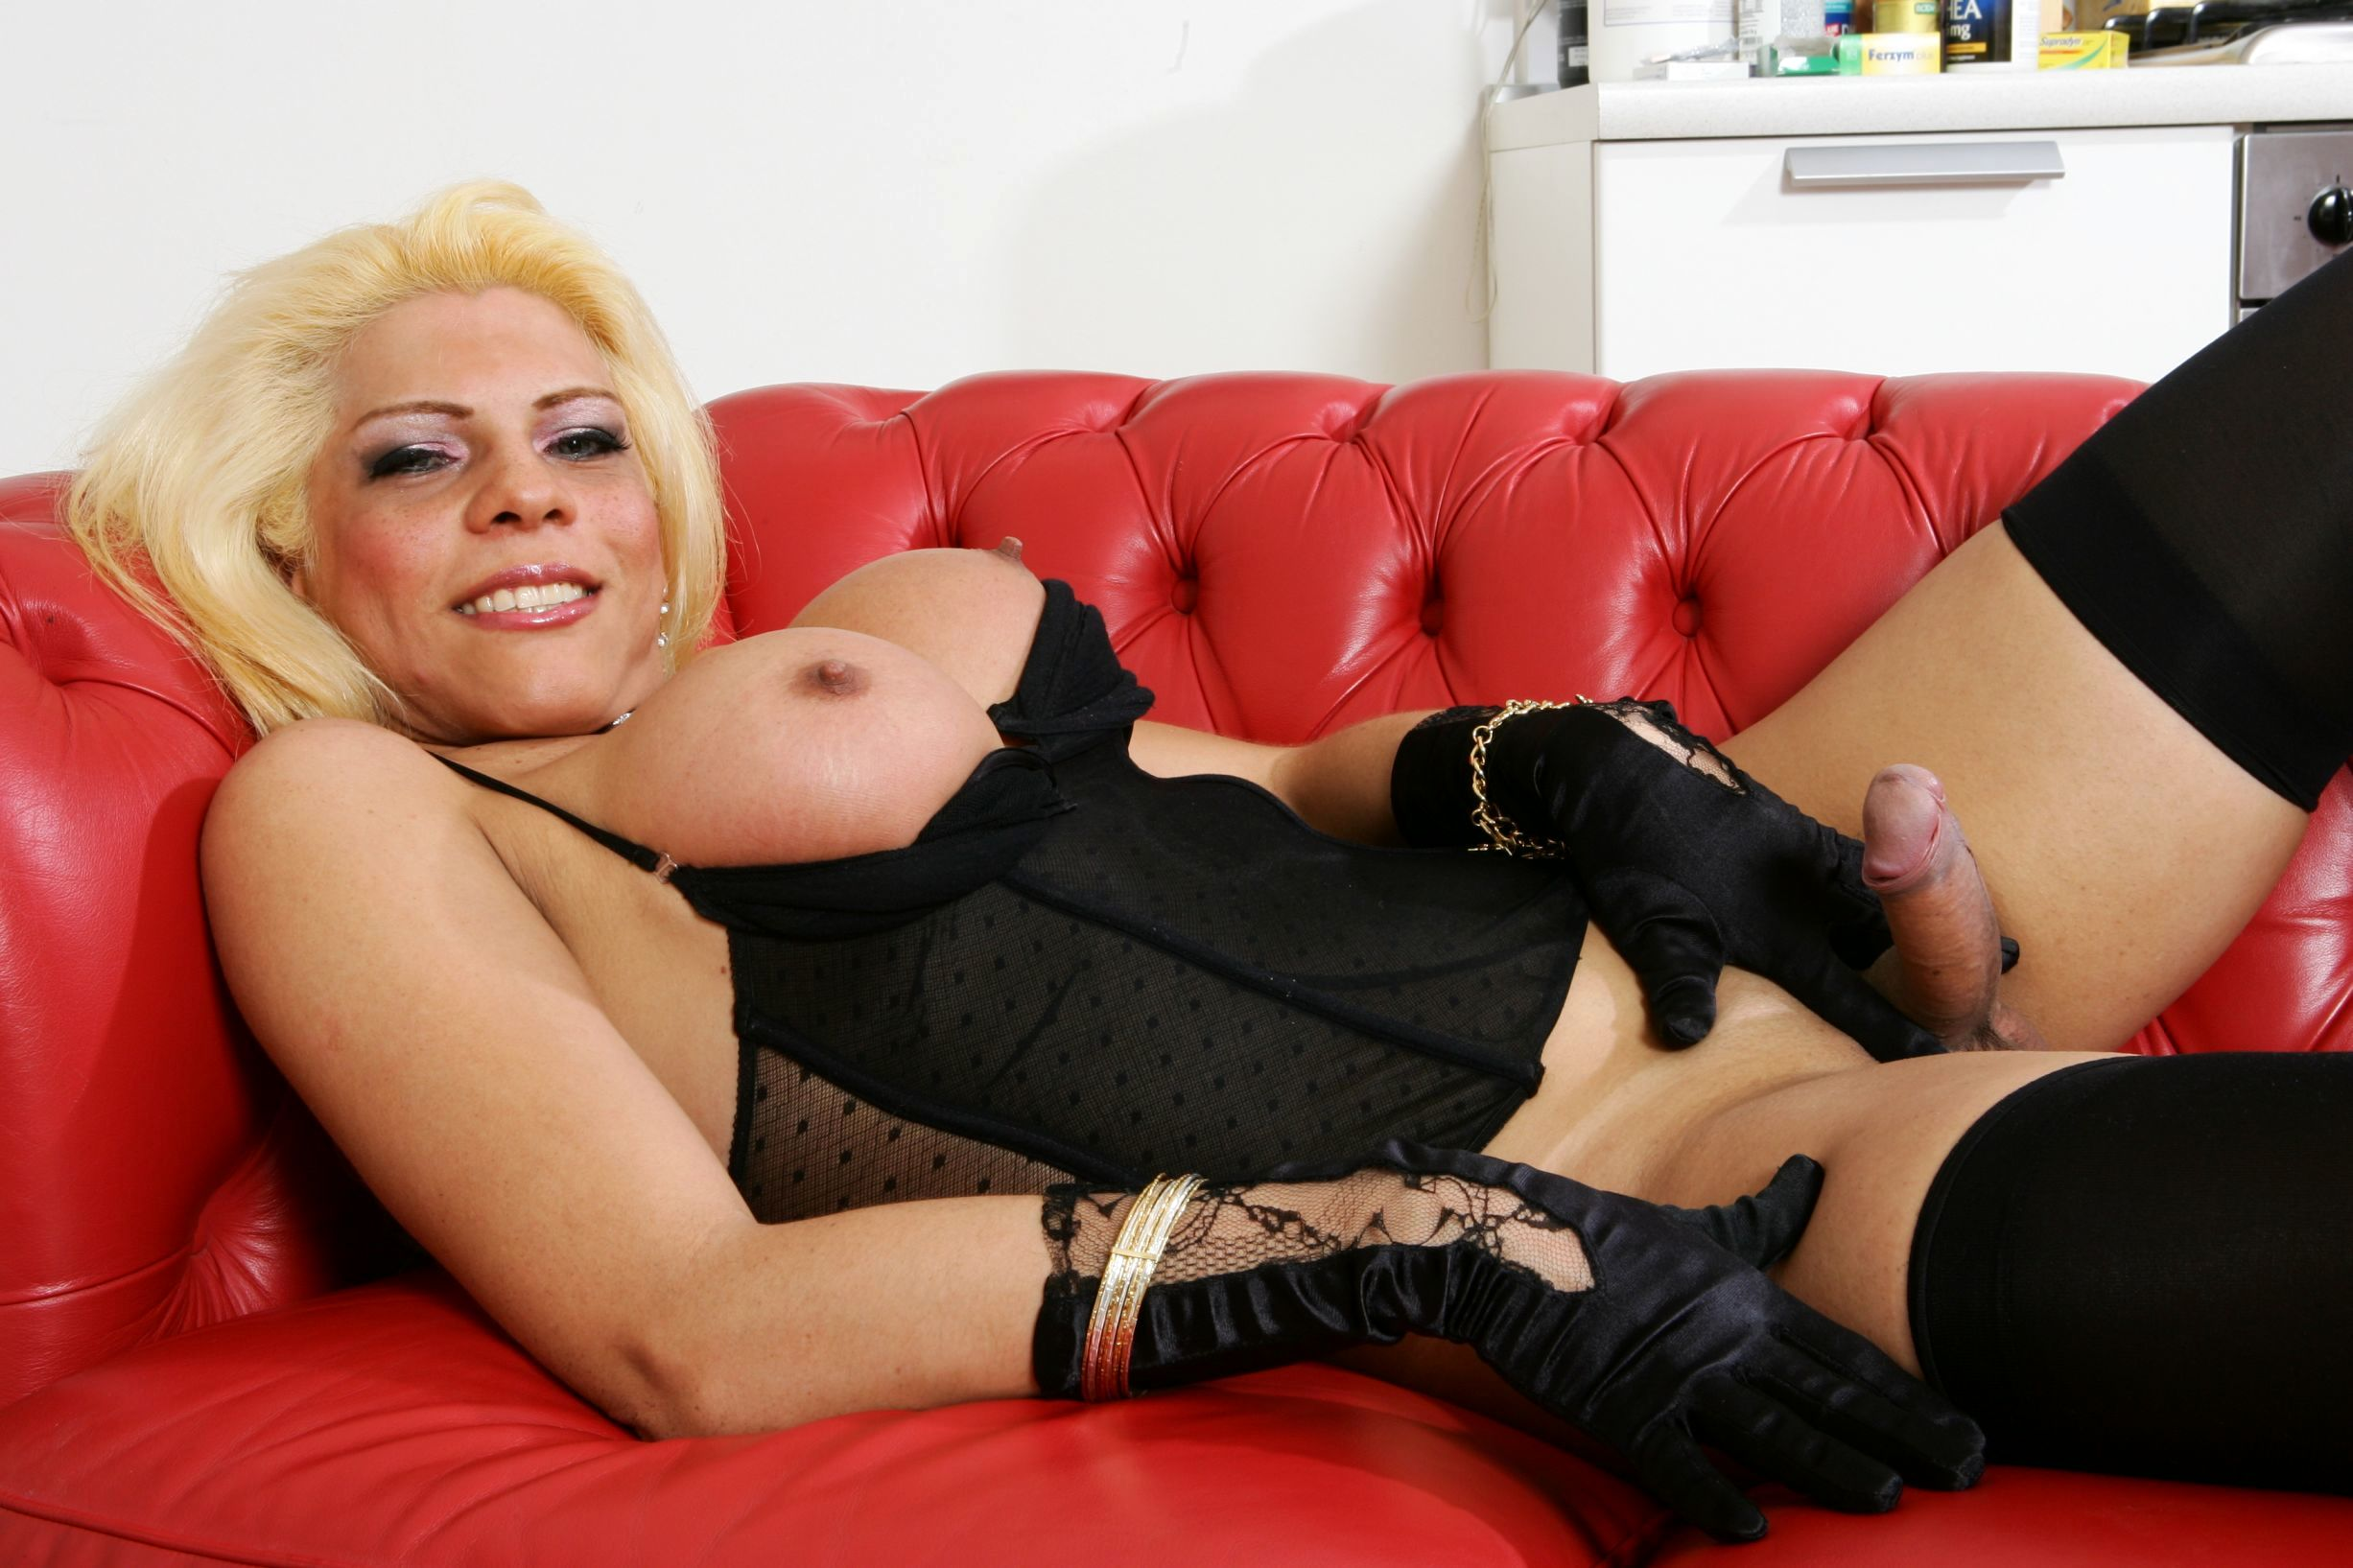 Busty Blond T-Girl Bangs